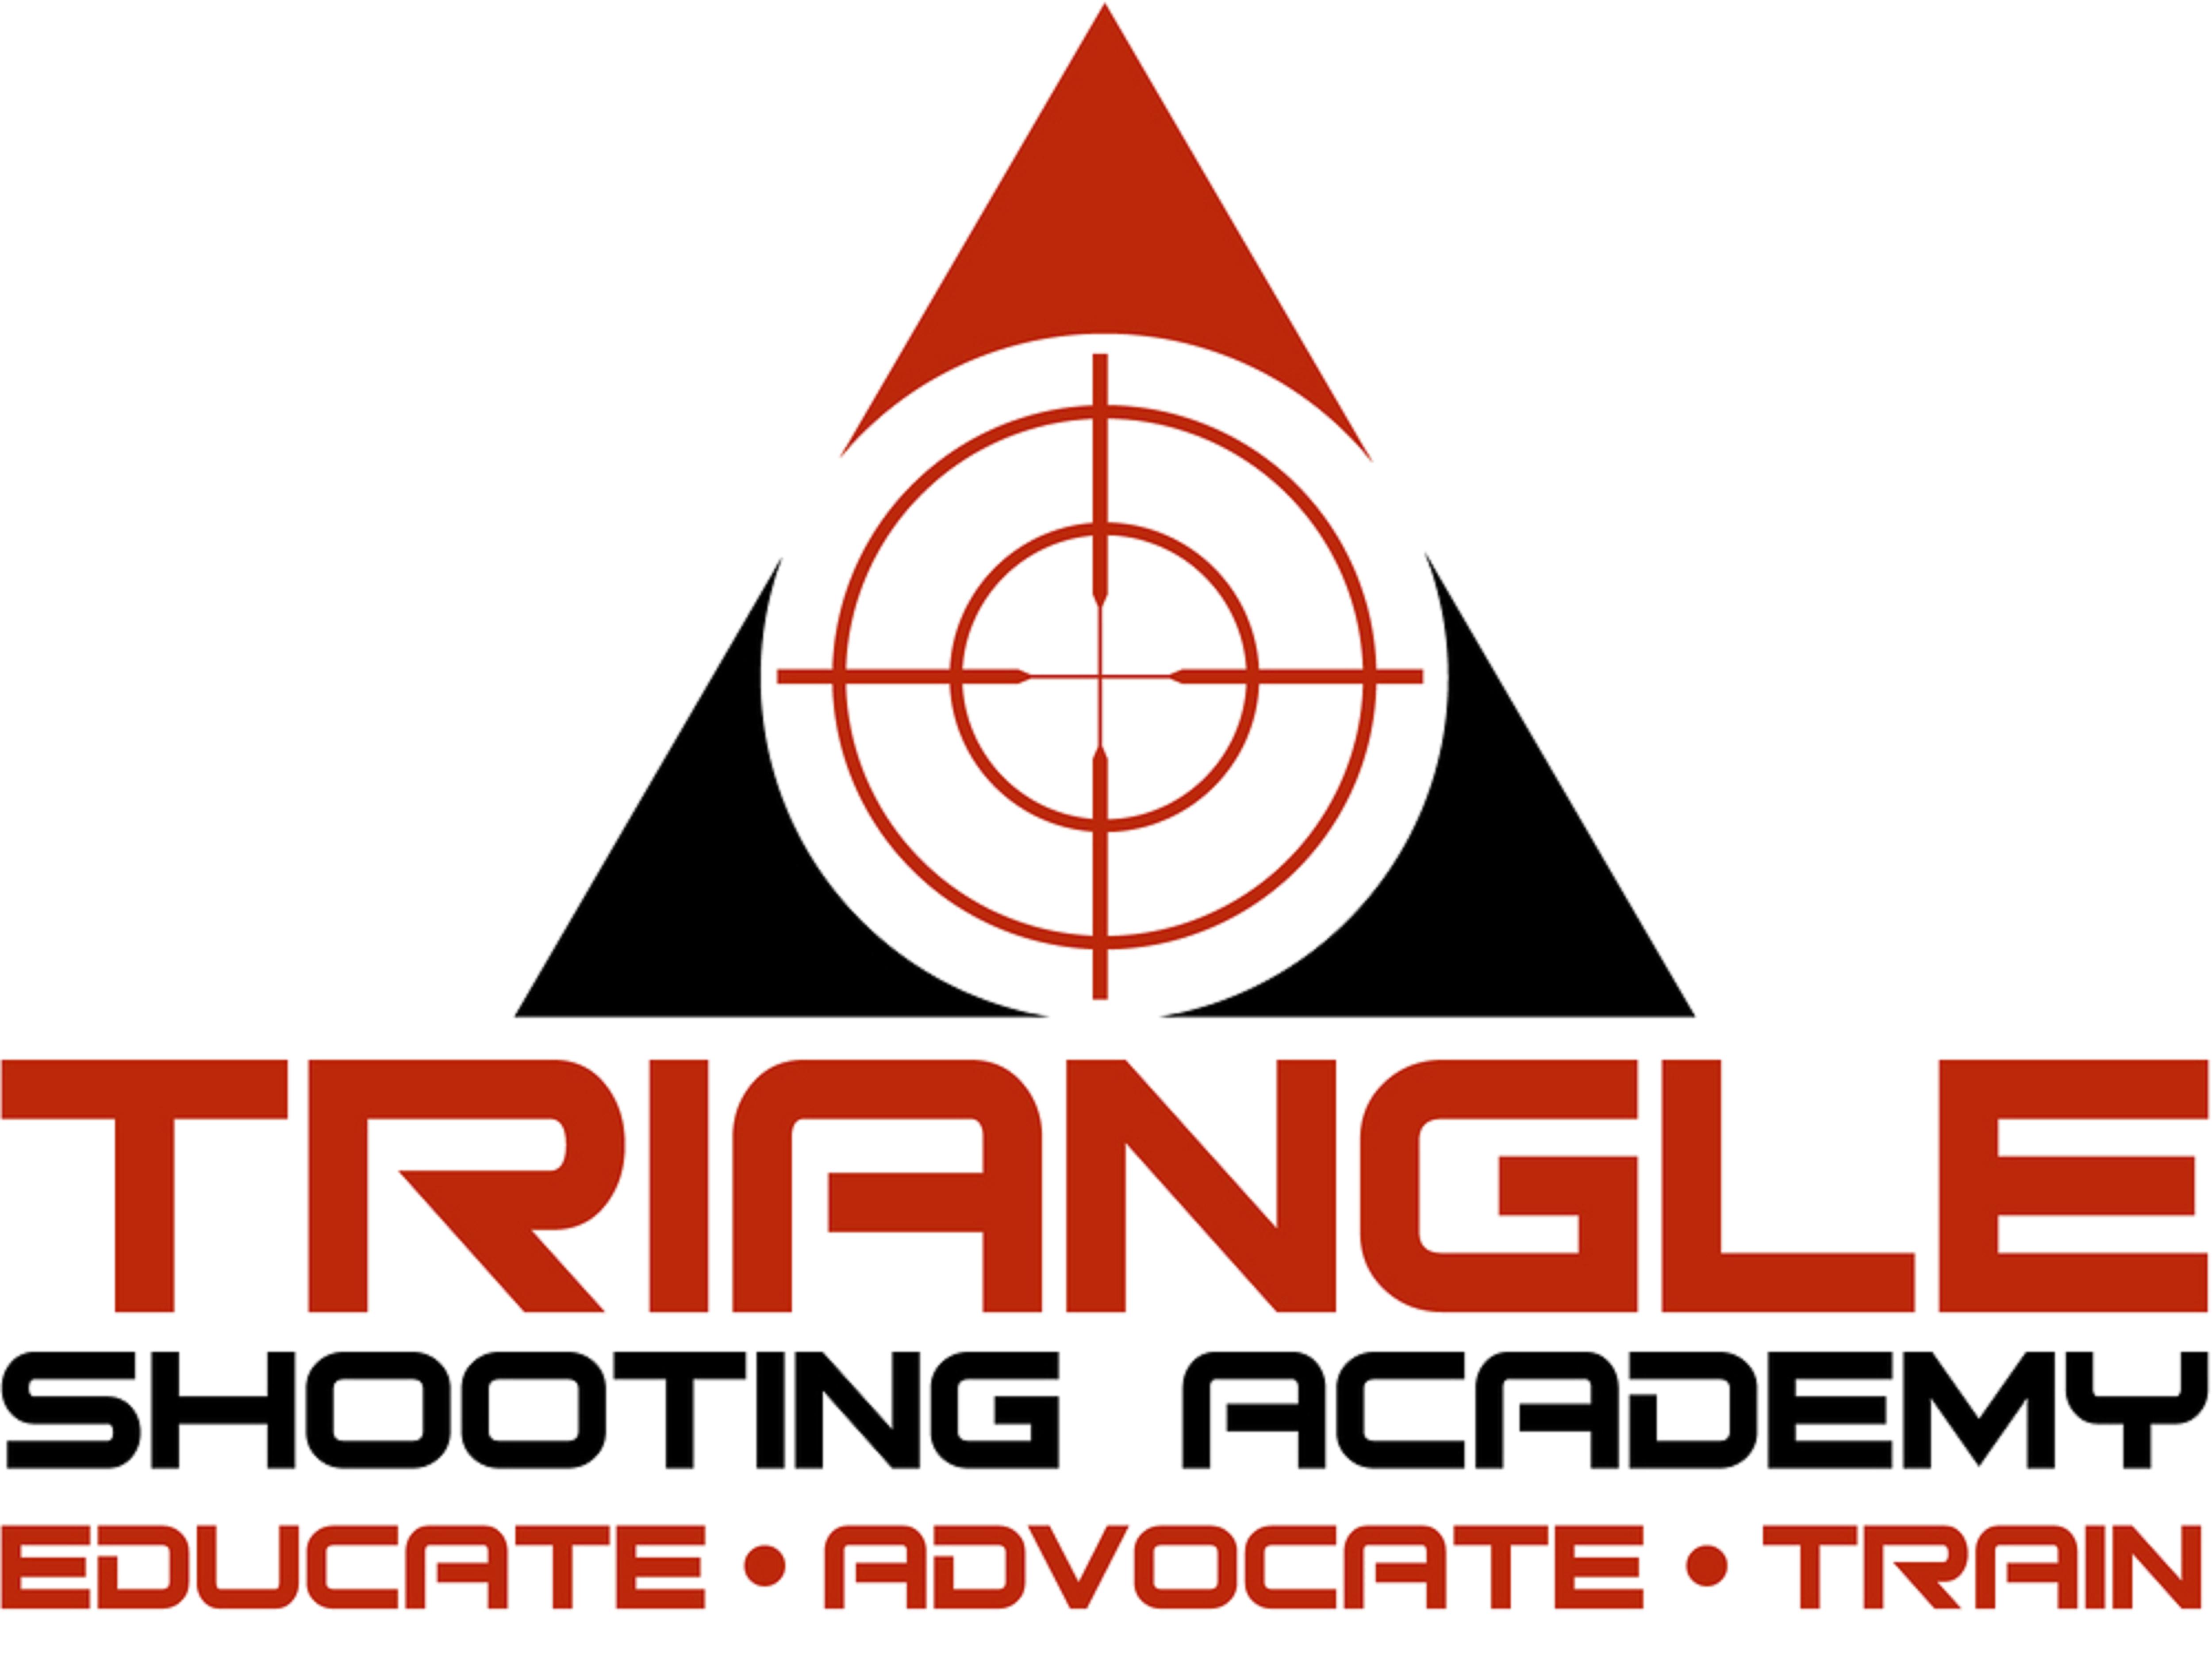 Sponsor Triangle Shooting Academy